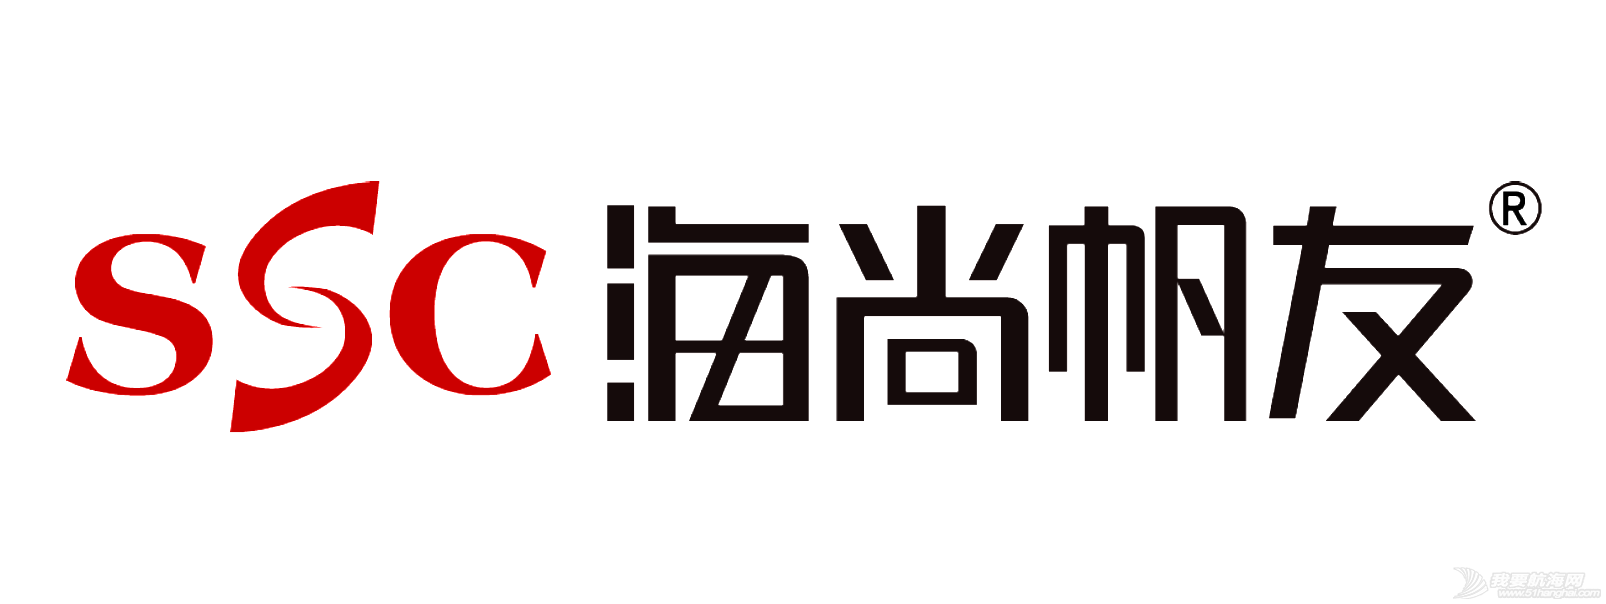 nbsp,帆船,FAREAST,提供,俱乐部 上海海尚帆友俱乐部【Shanghai Sailing Club】  105233llczpl5vocfbscp1